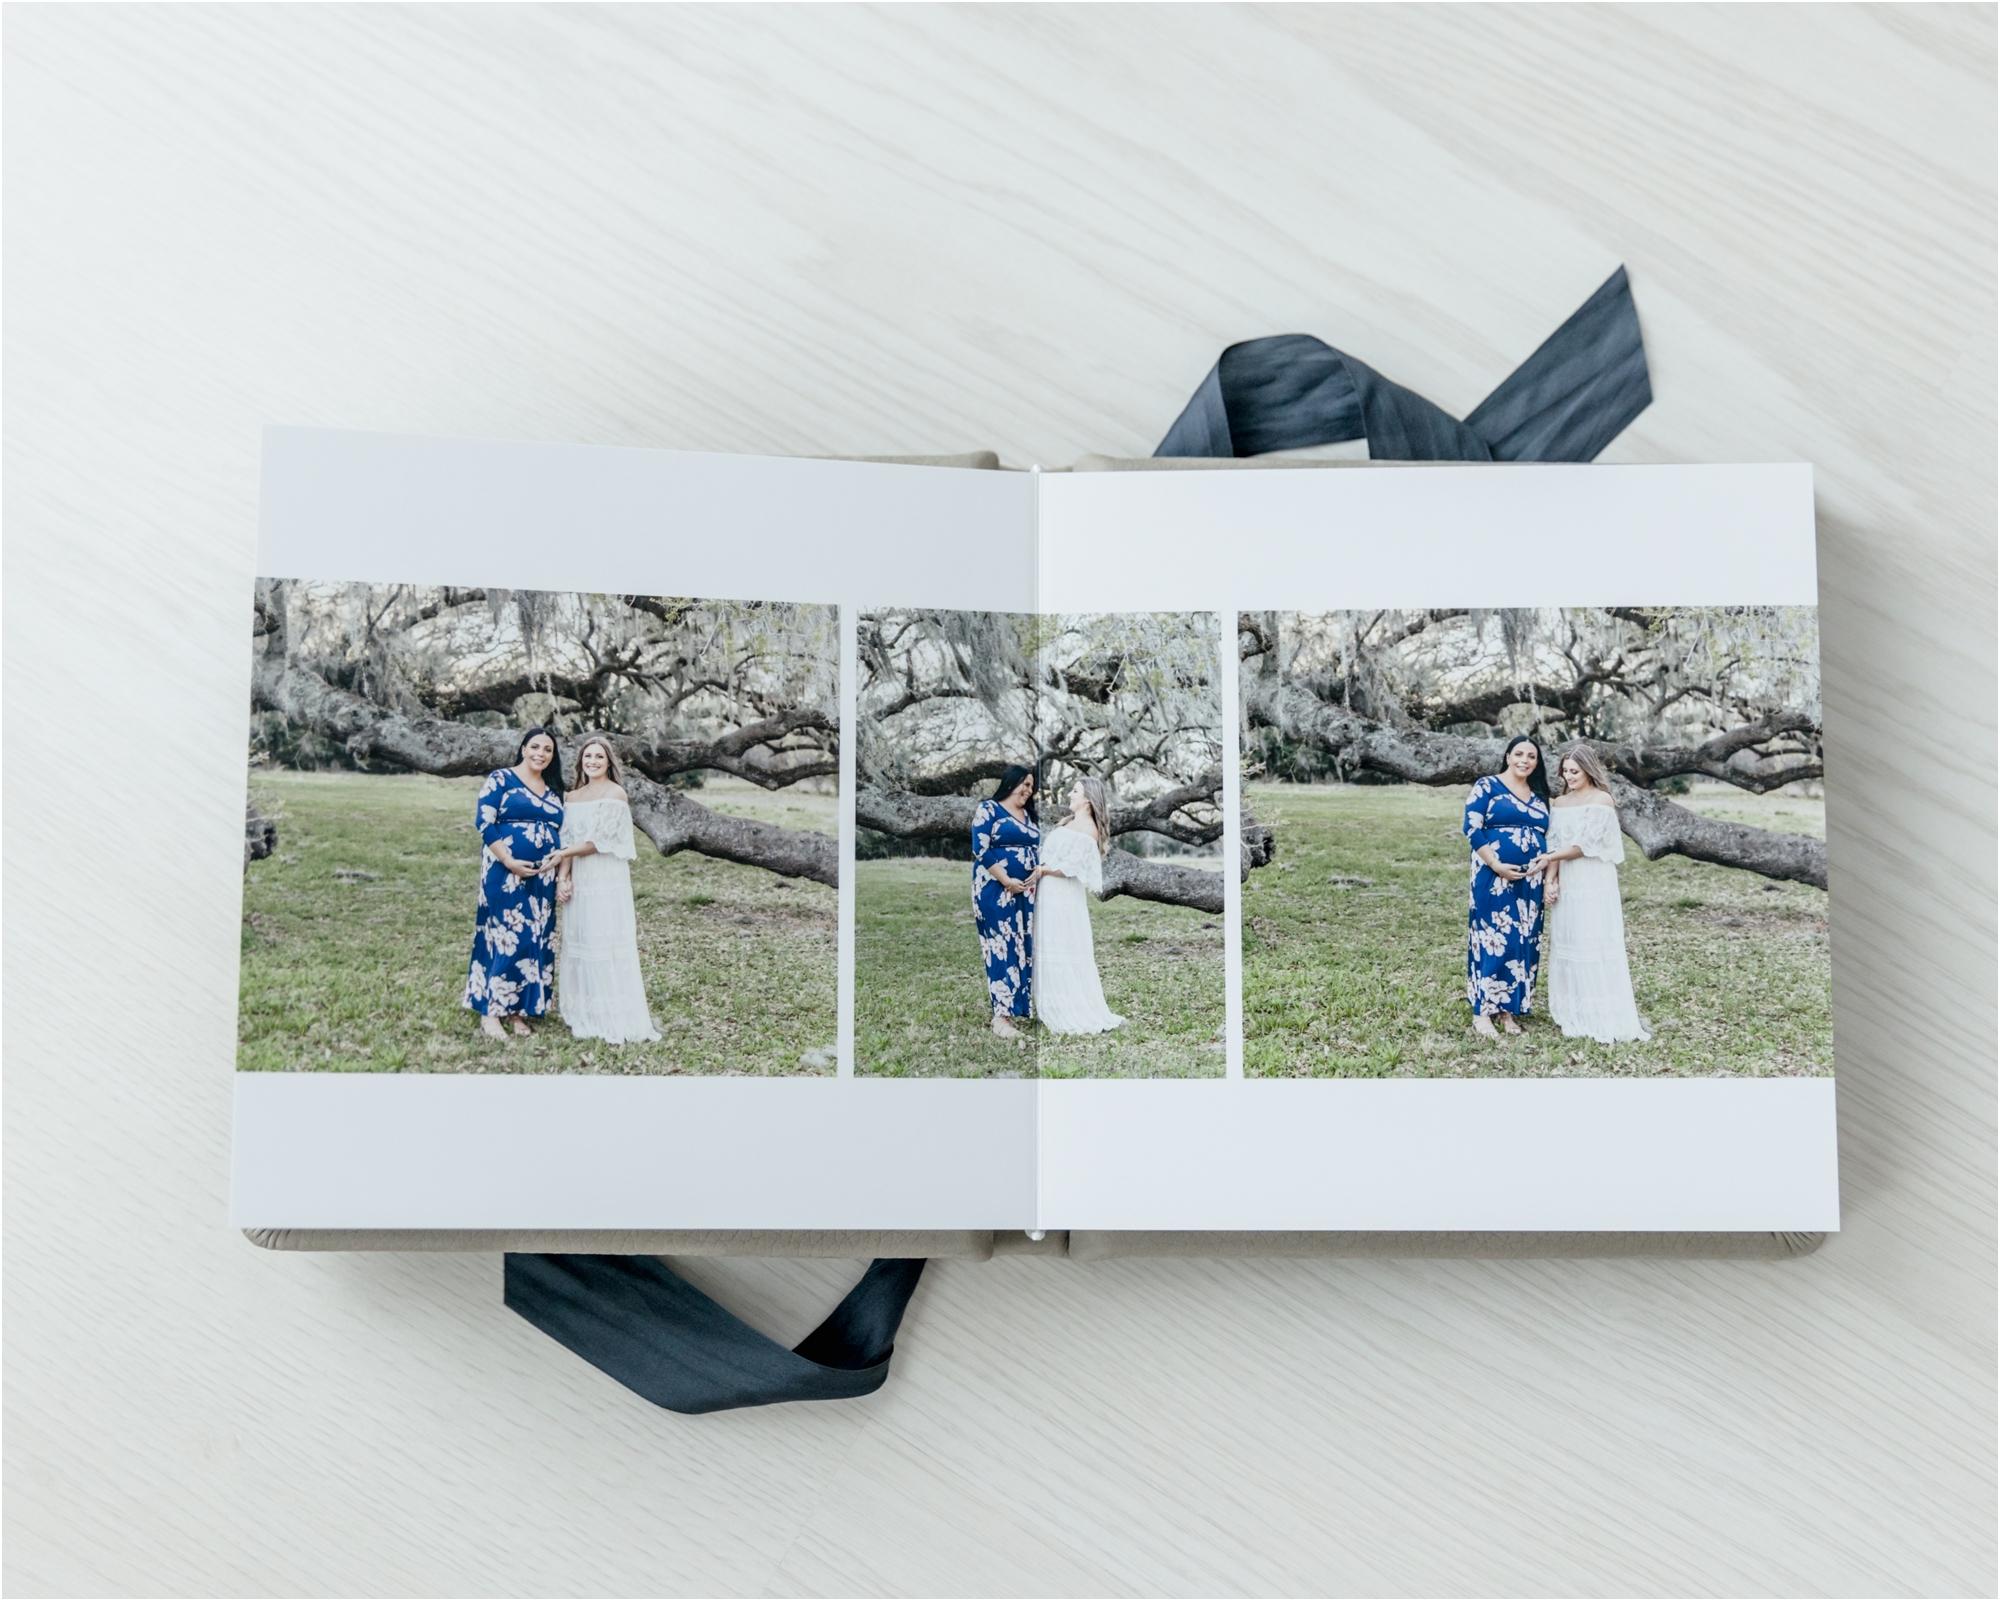 Inside of custom, heirloom album designed by Houston surrogate maternity photographer, Lifetime of Clicks Photography.